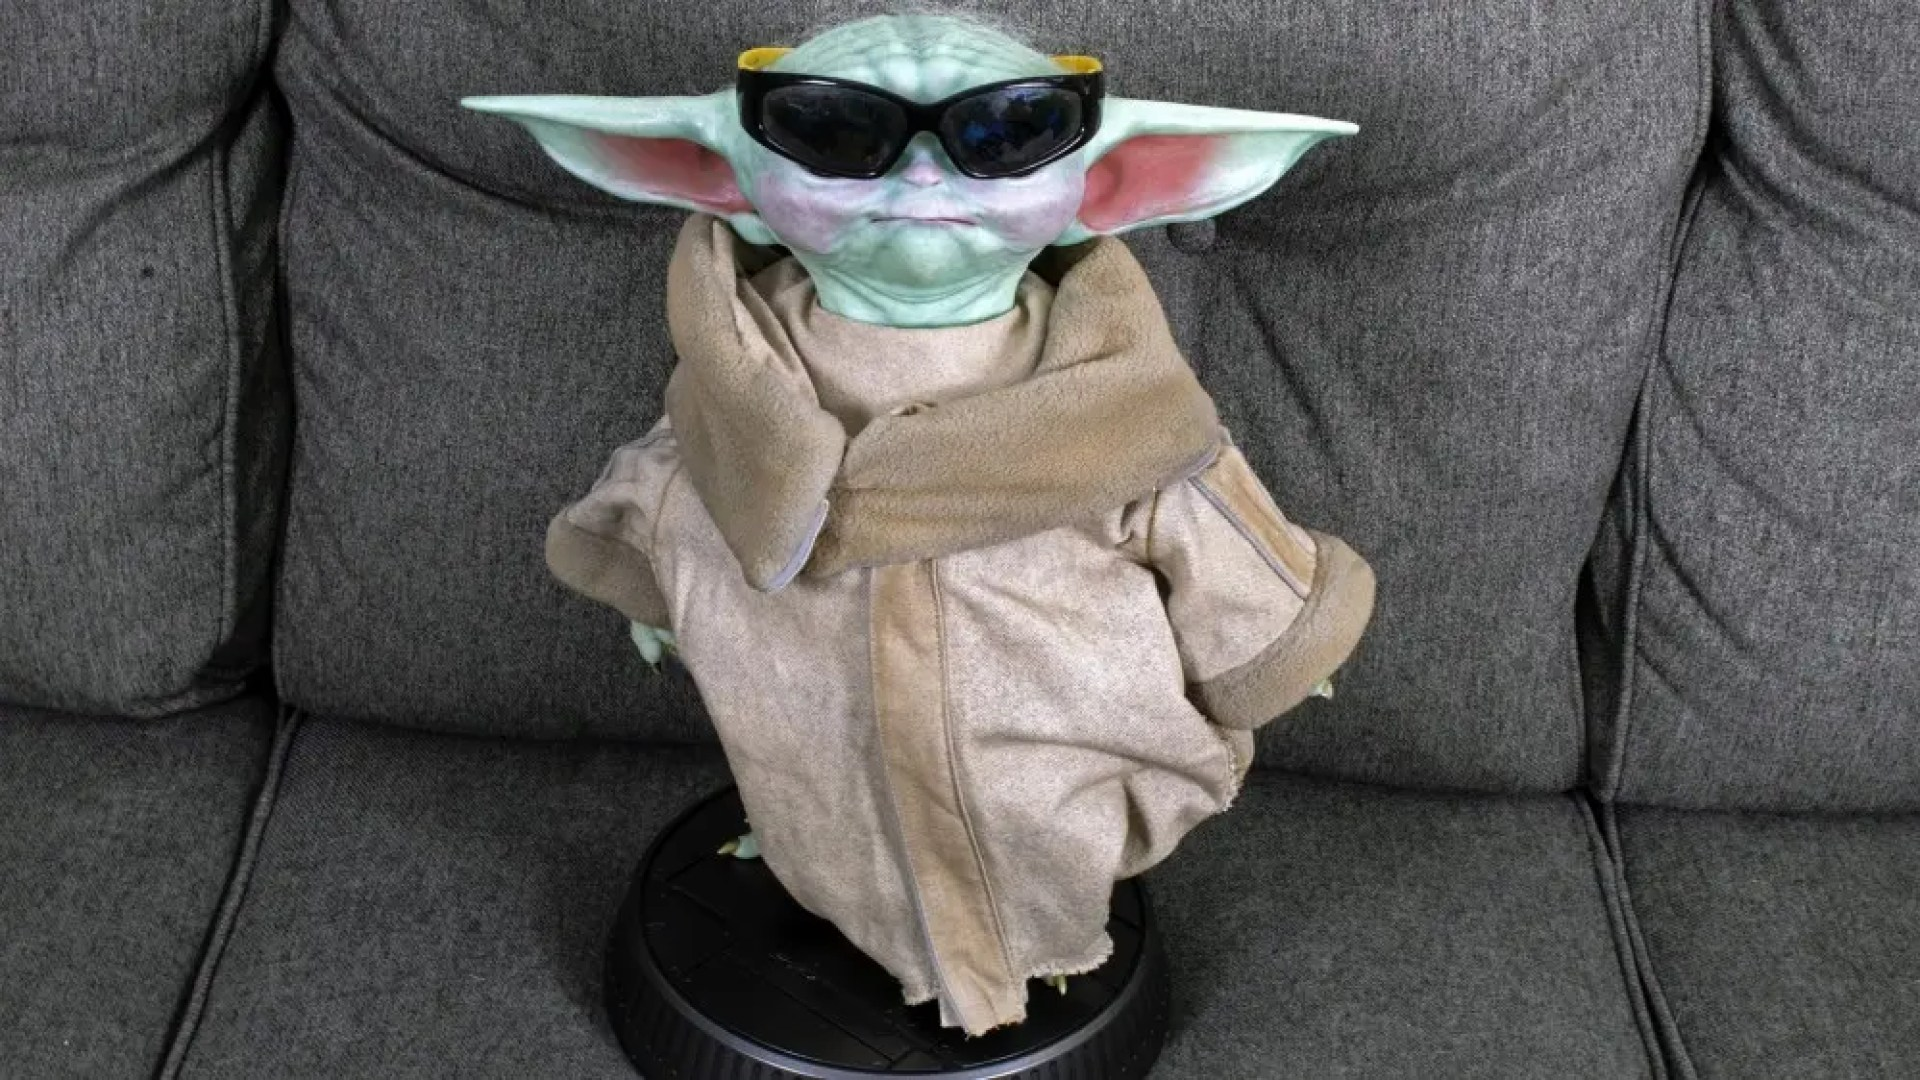 Baby Yoda wearing sunglasses